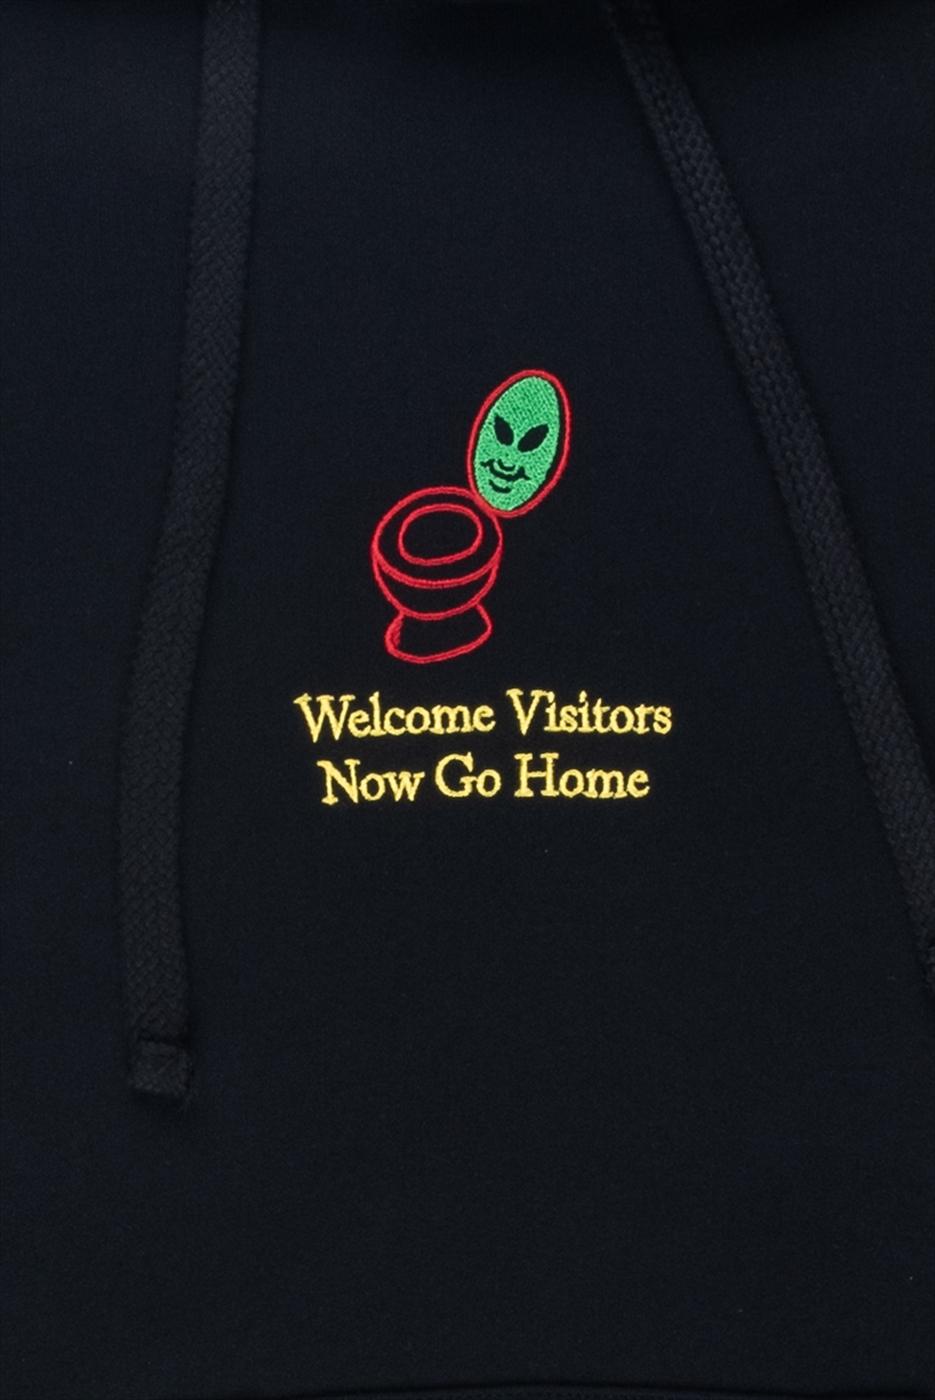 【PAS DE MER/パドゥメ】WELCOME VISITORS HOODY パーカー / BLACK